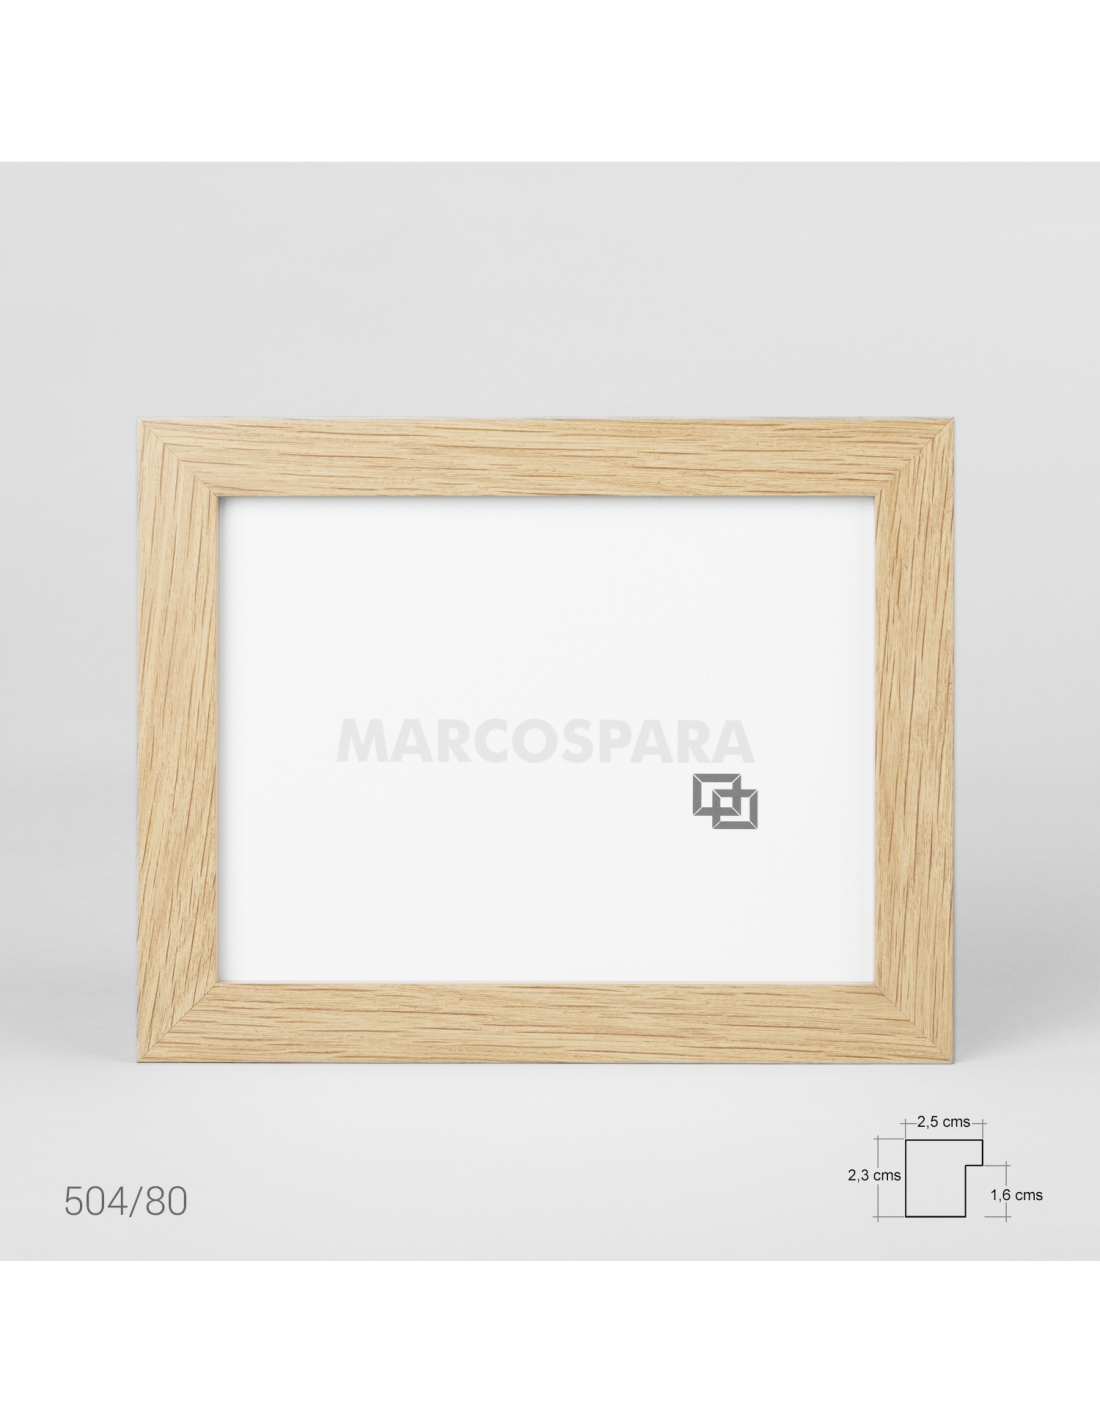 Marcos de madera para posters M504